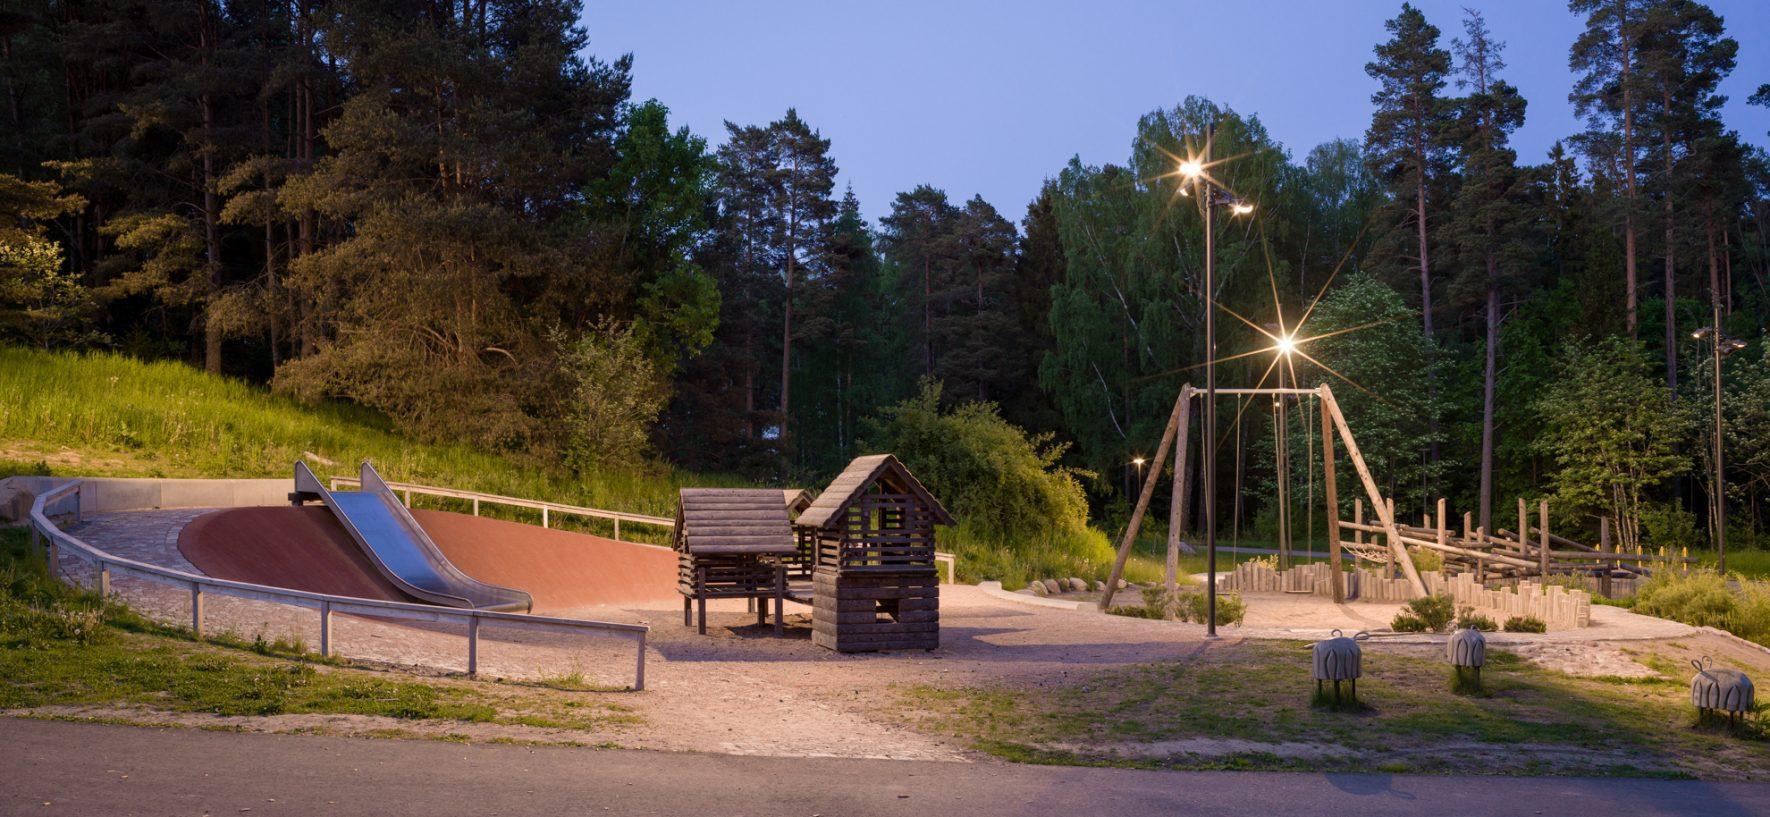 Vivallakullen, Örebro